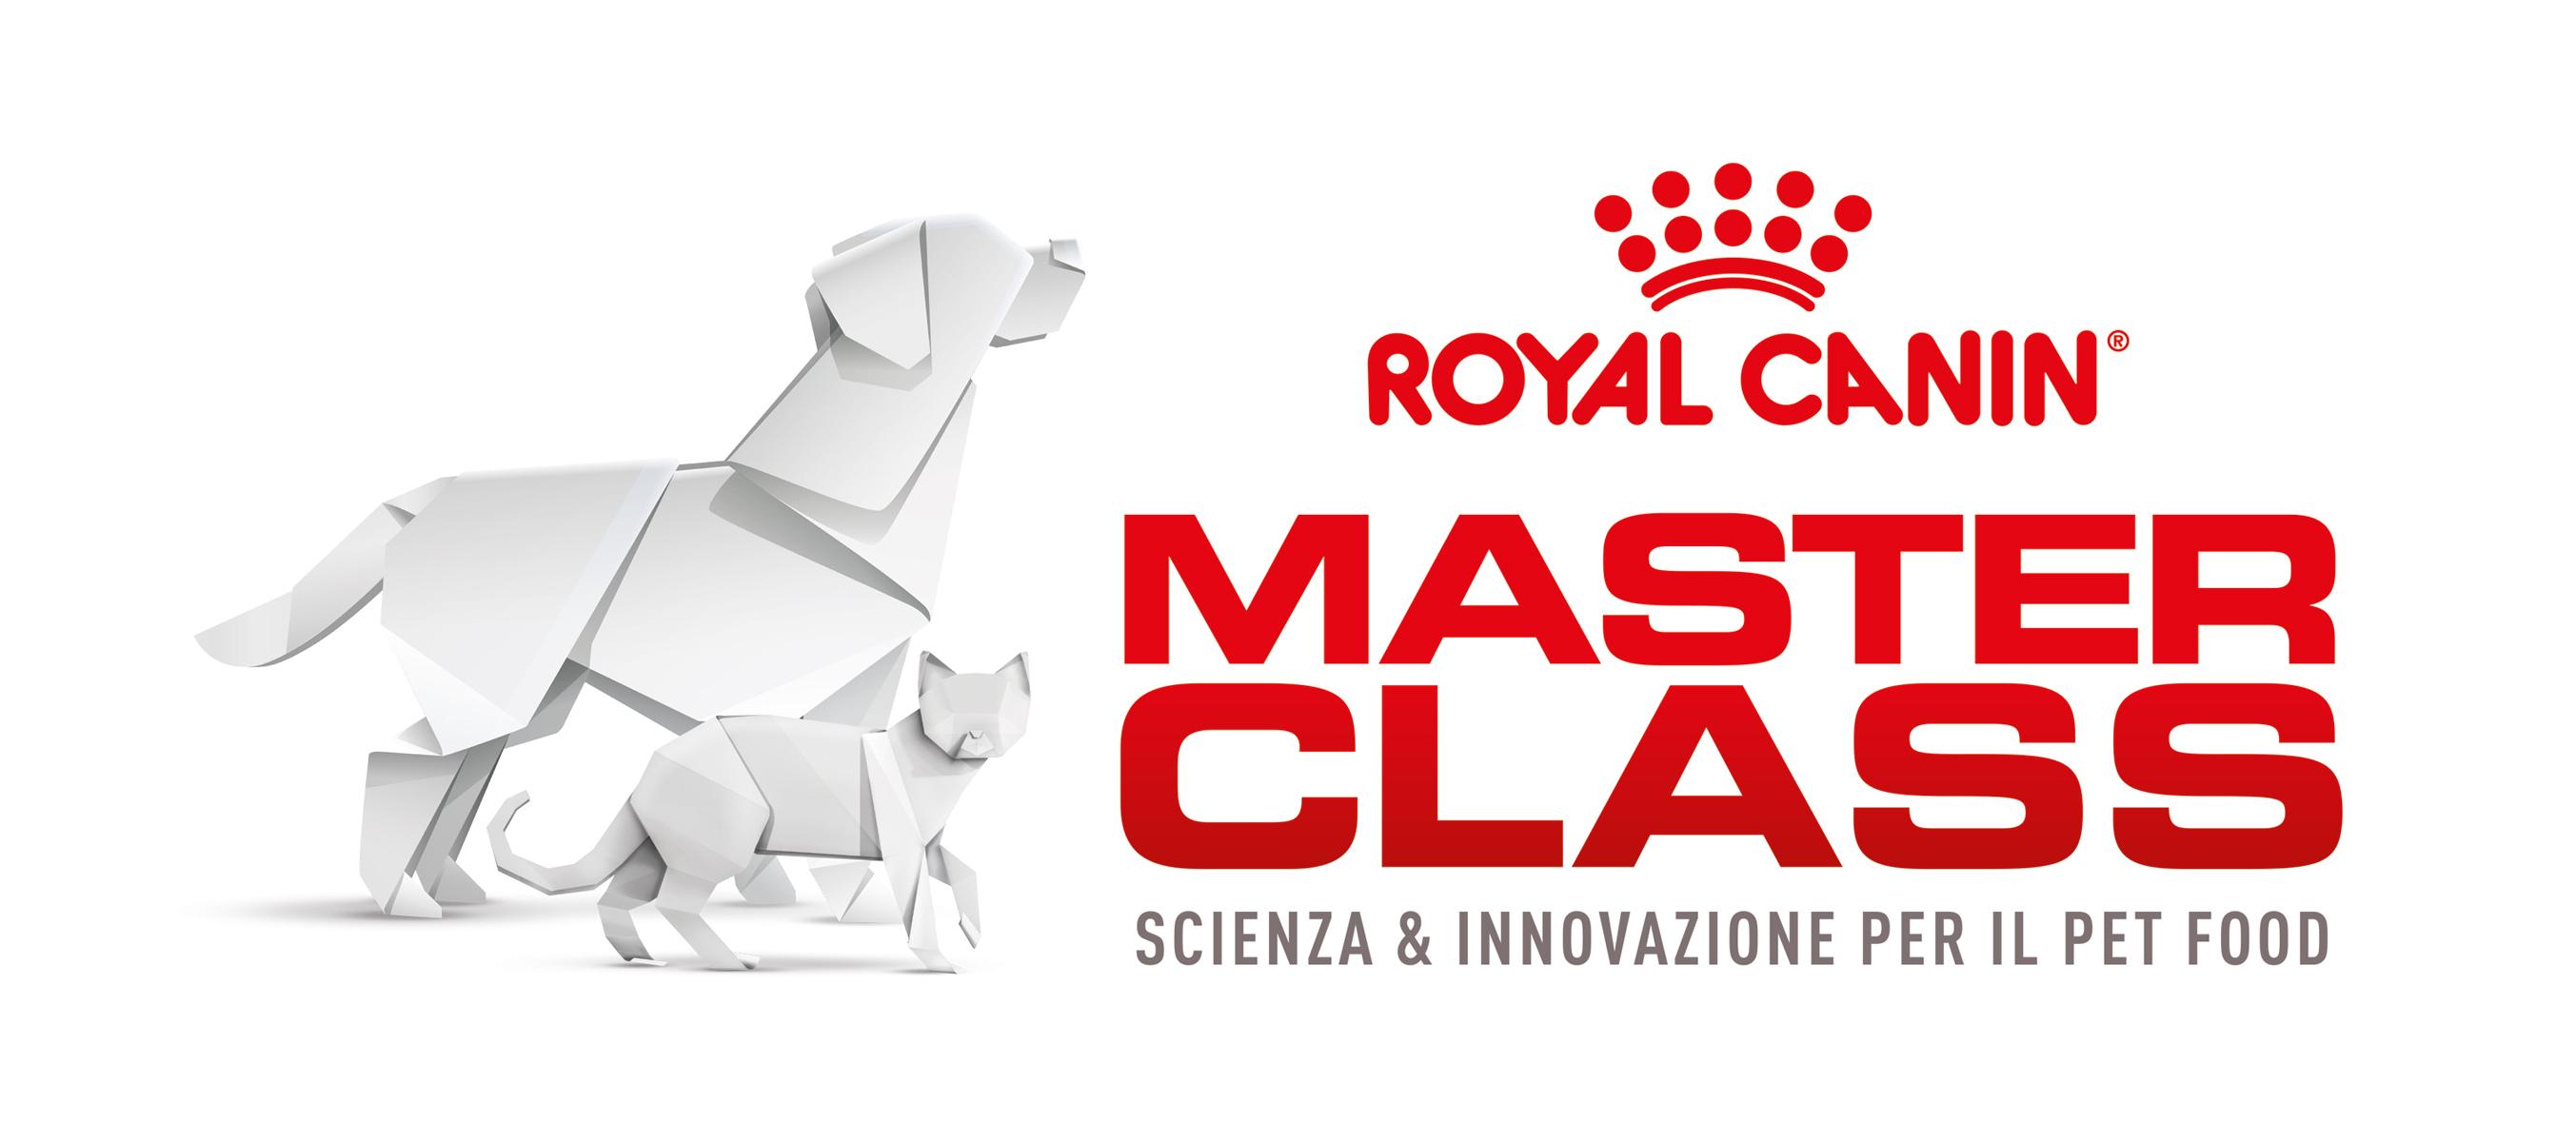 Royal Canin - Master Class